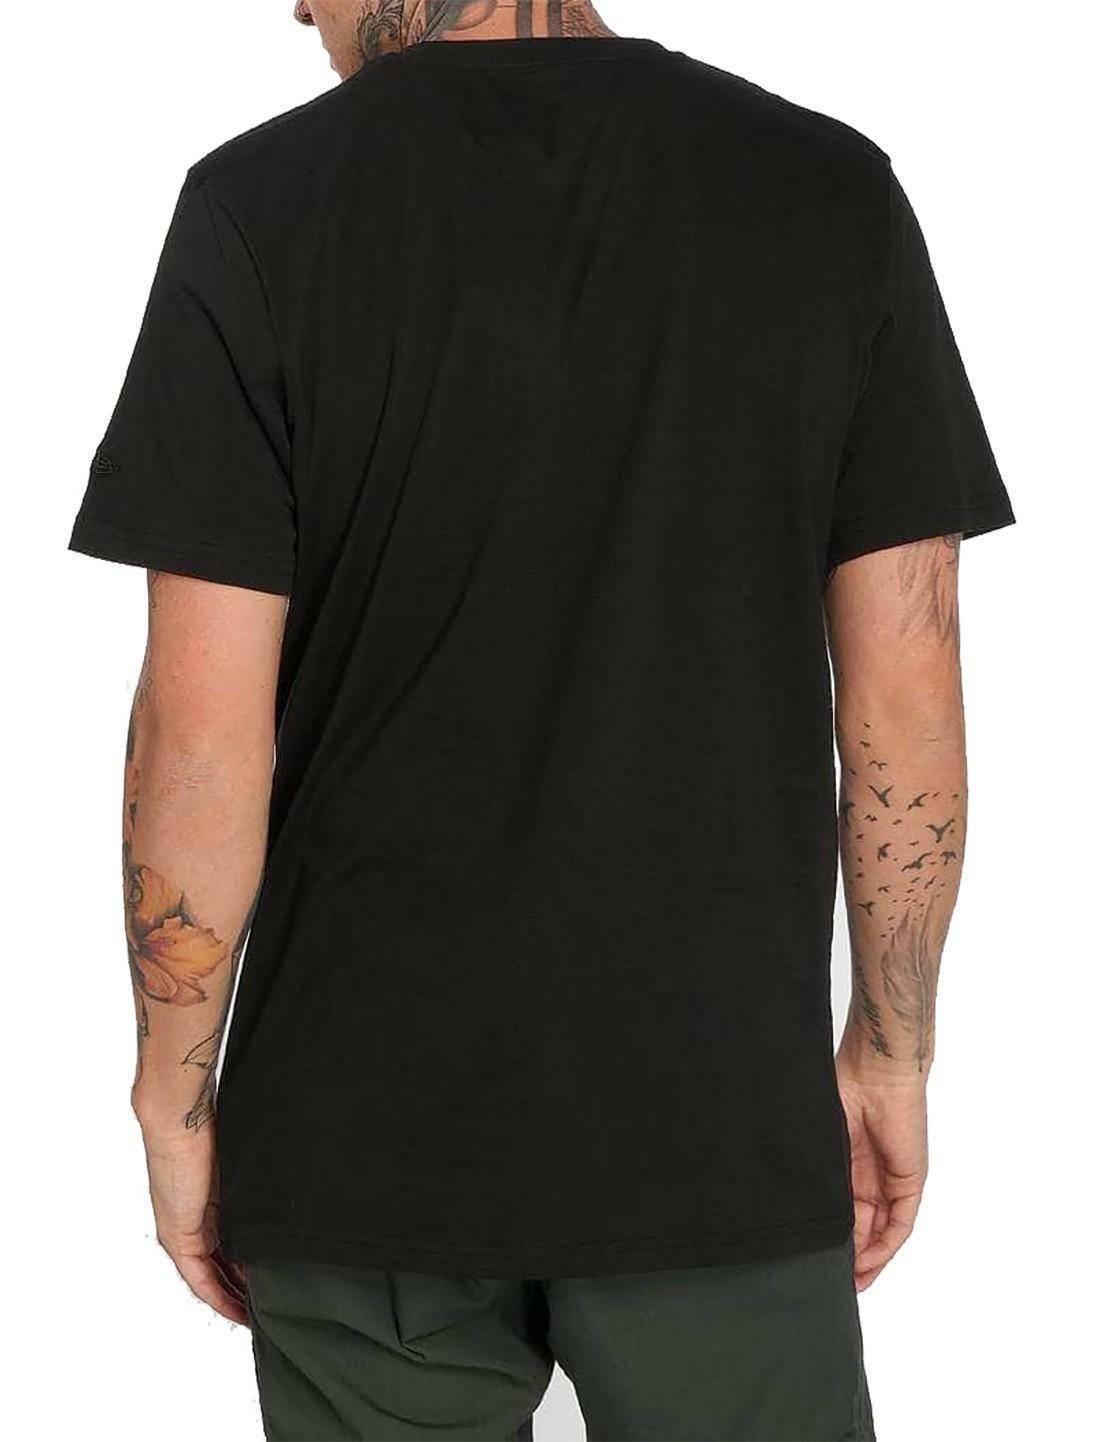 new era new era team apparel infill logo tee losdod t-shirt uomo nera 11569446